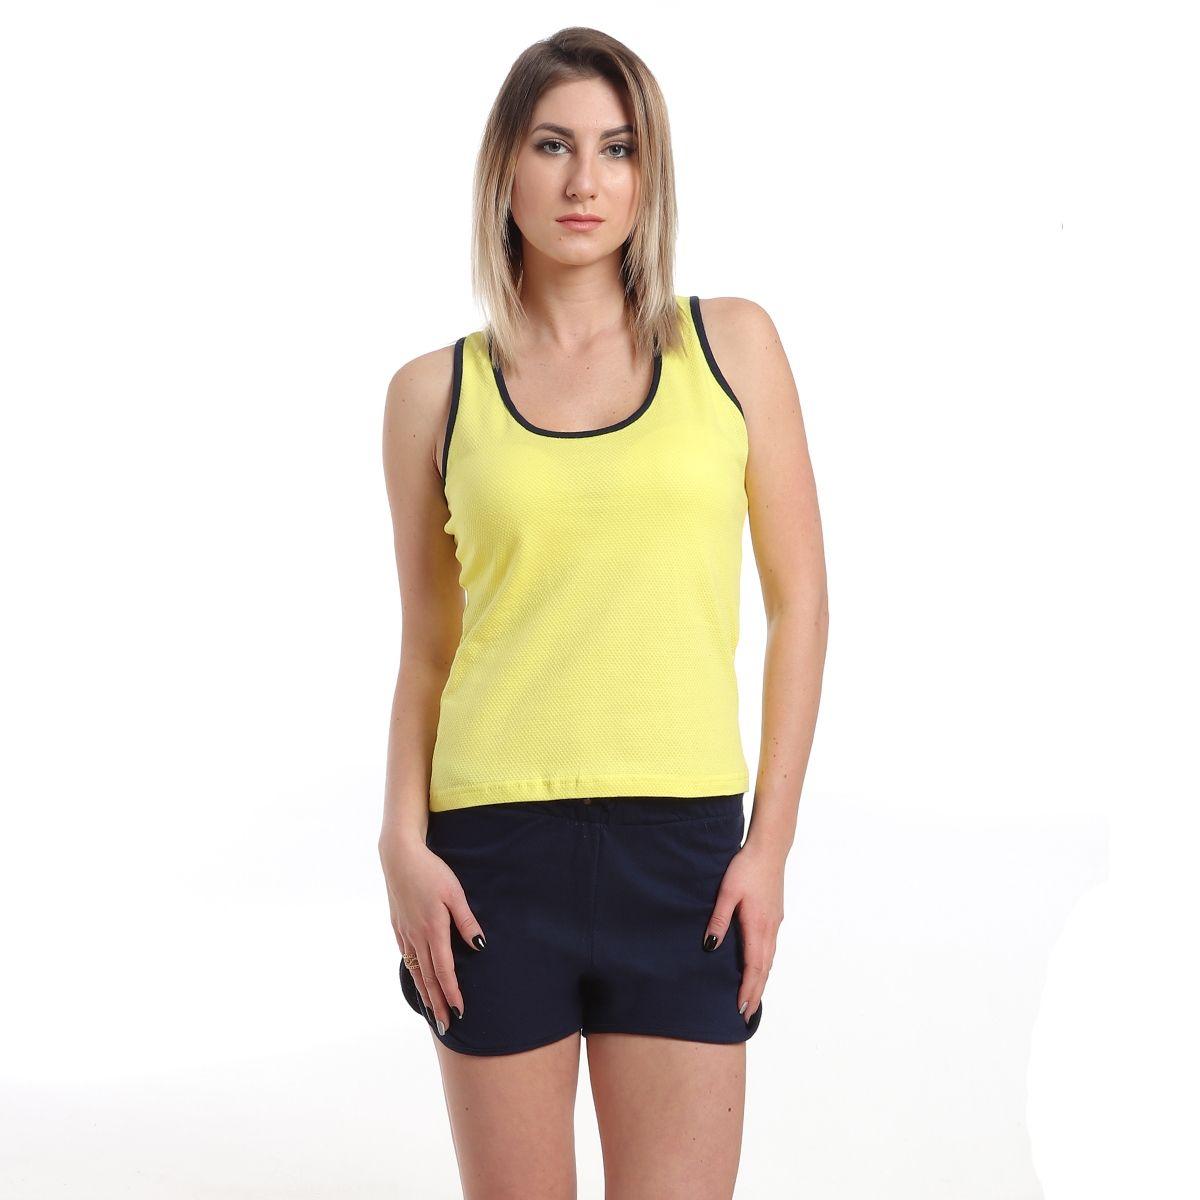 510f94678c92 Generic Pajama Cotton Hot Short - Yellow   Navy Blue